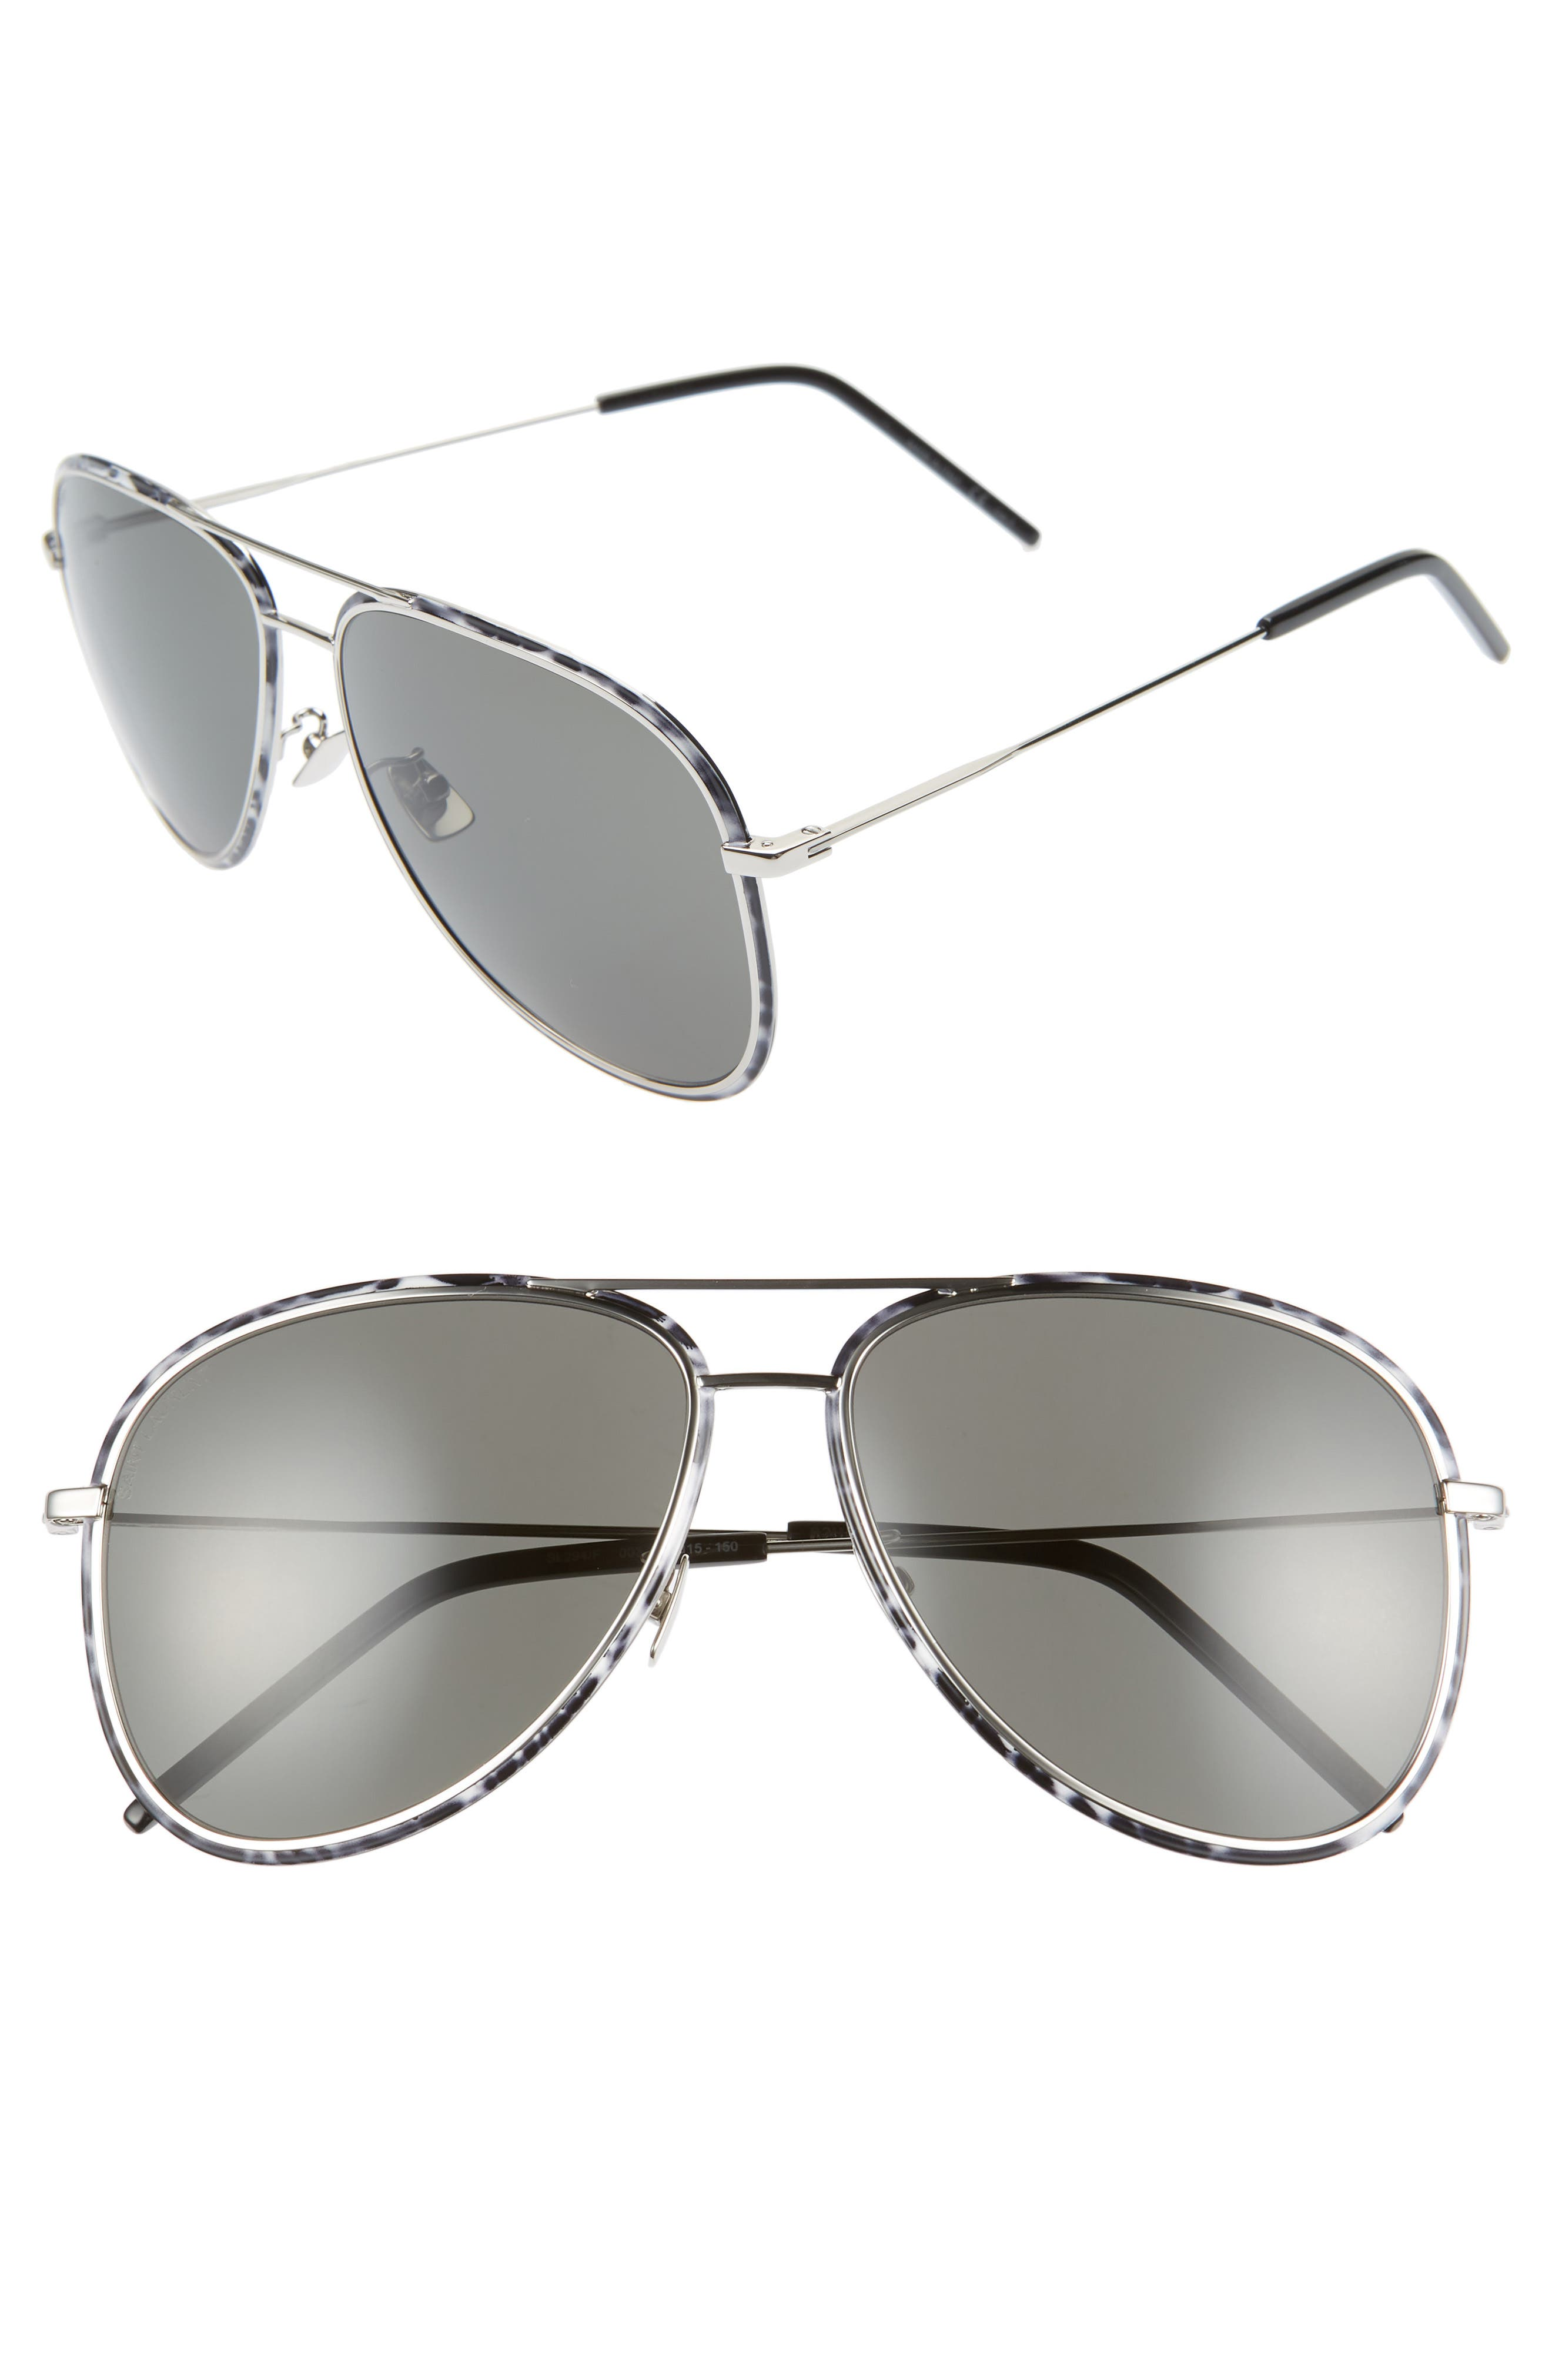 Saint Laurent 61Mm Aviator Sunglasses - Silver/ Black White / Grey